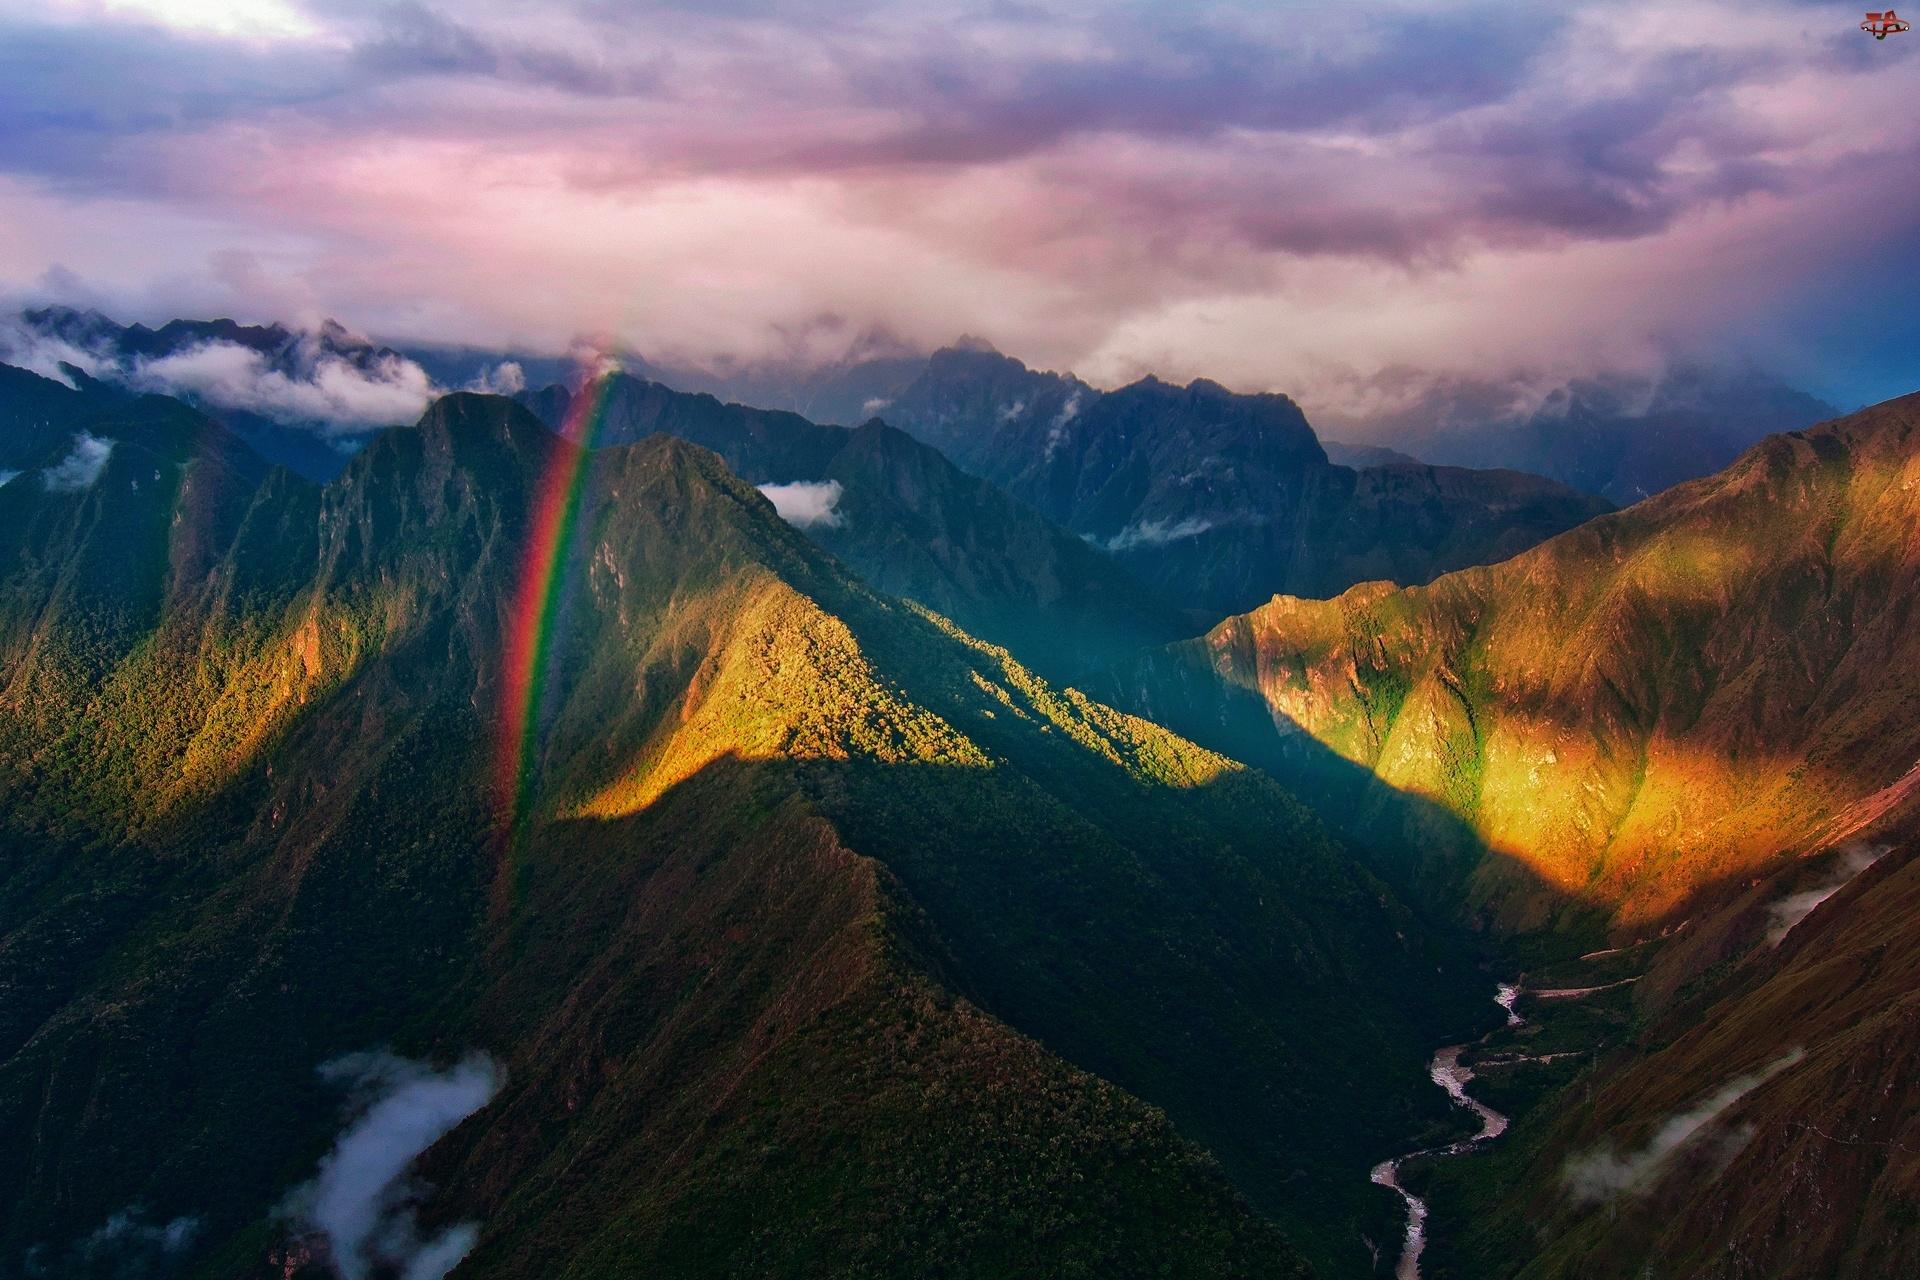 Tęcza, Chmury, Góry